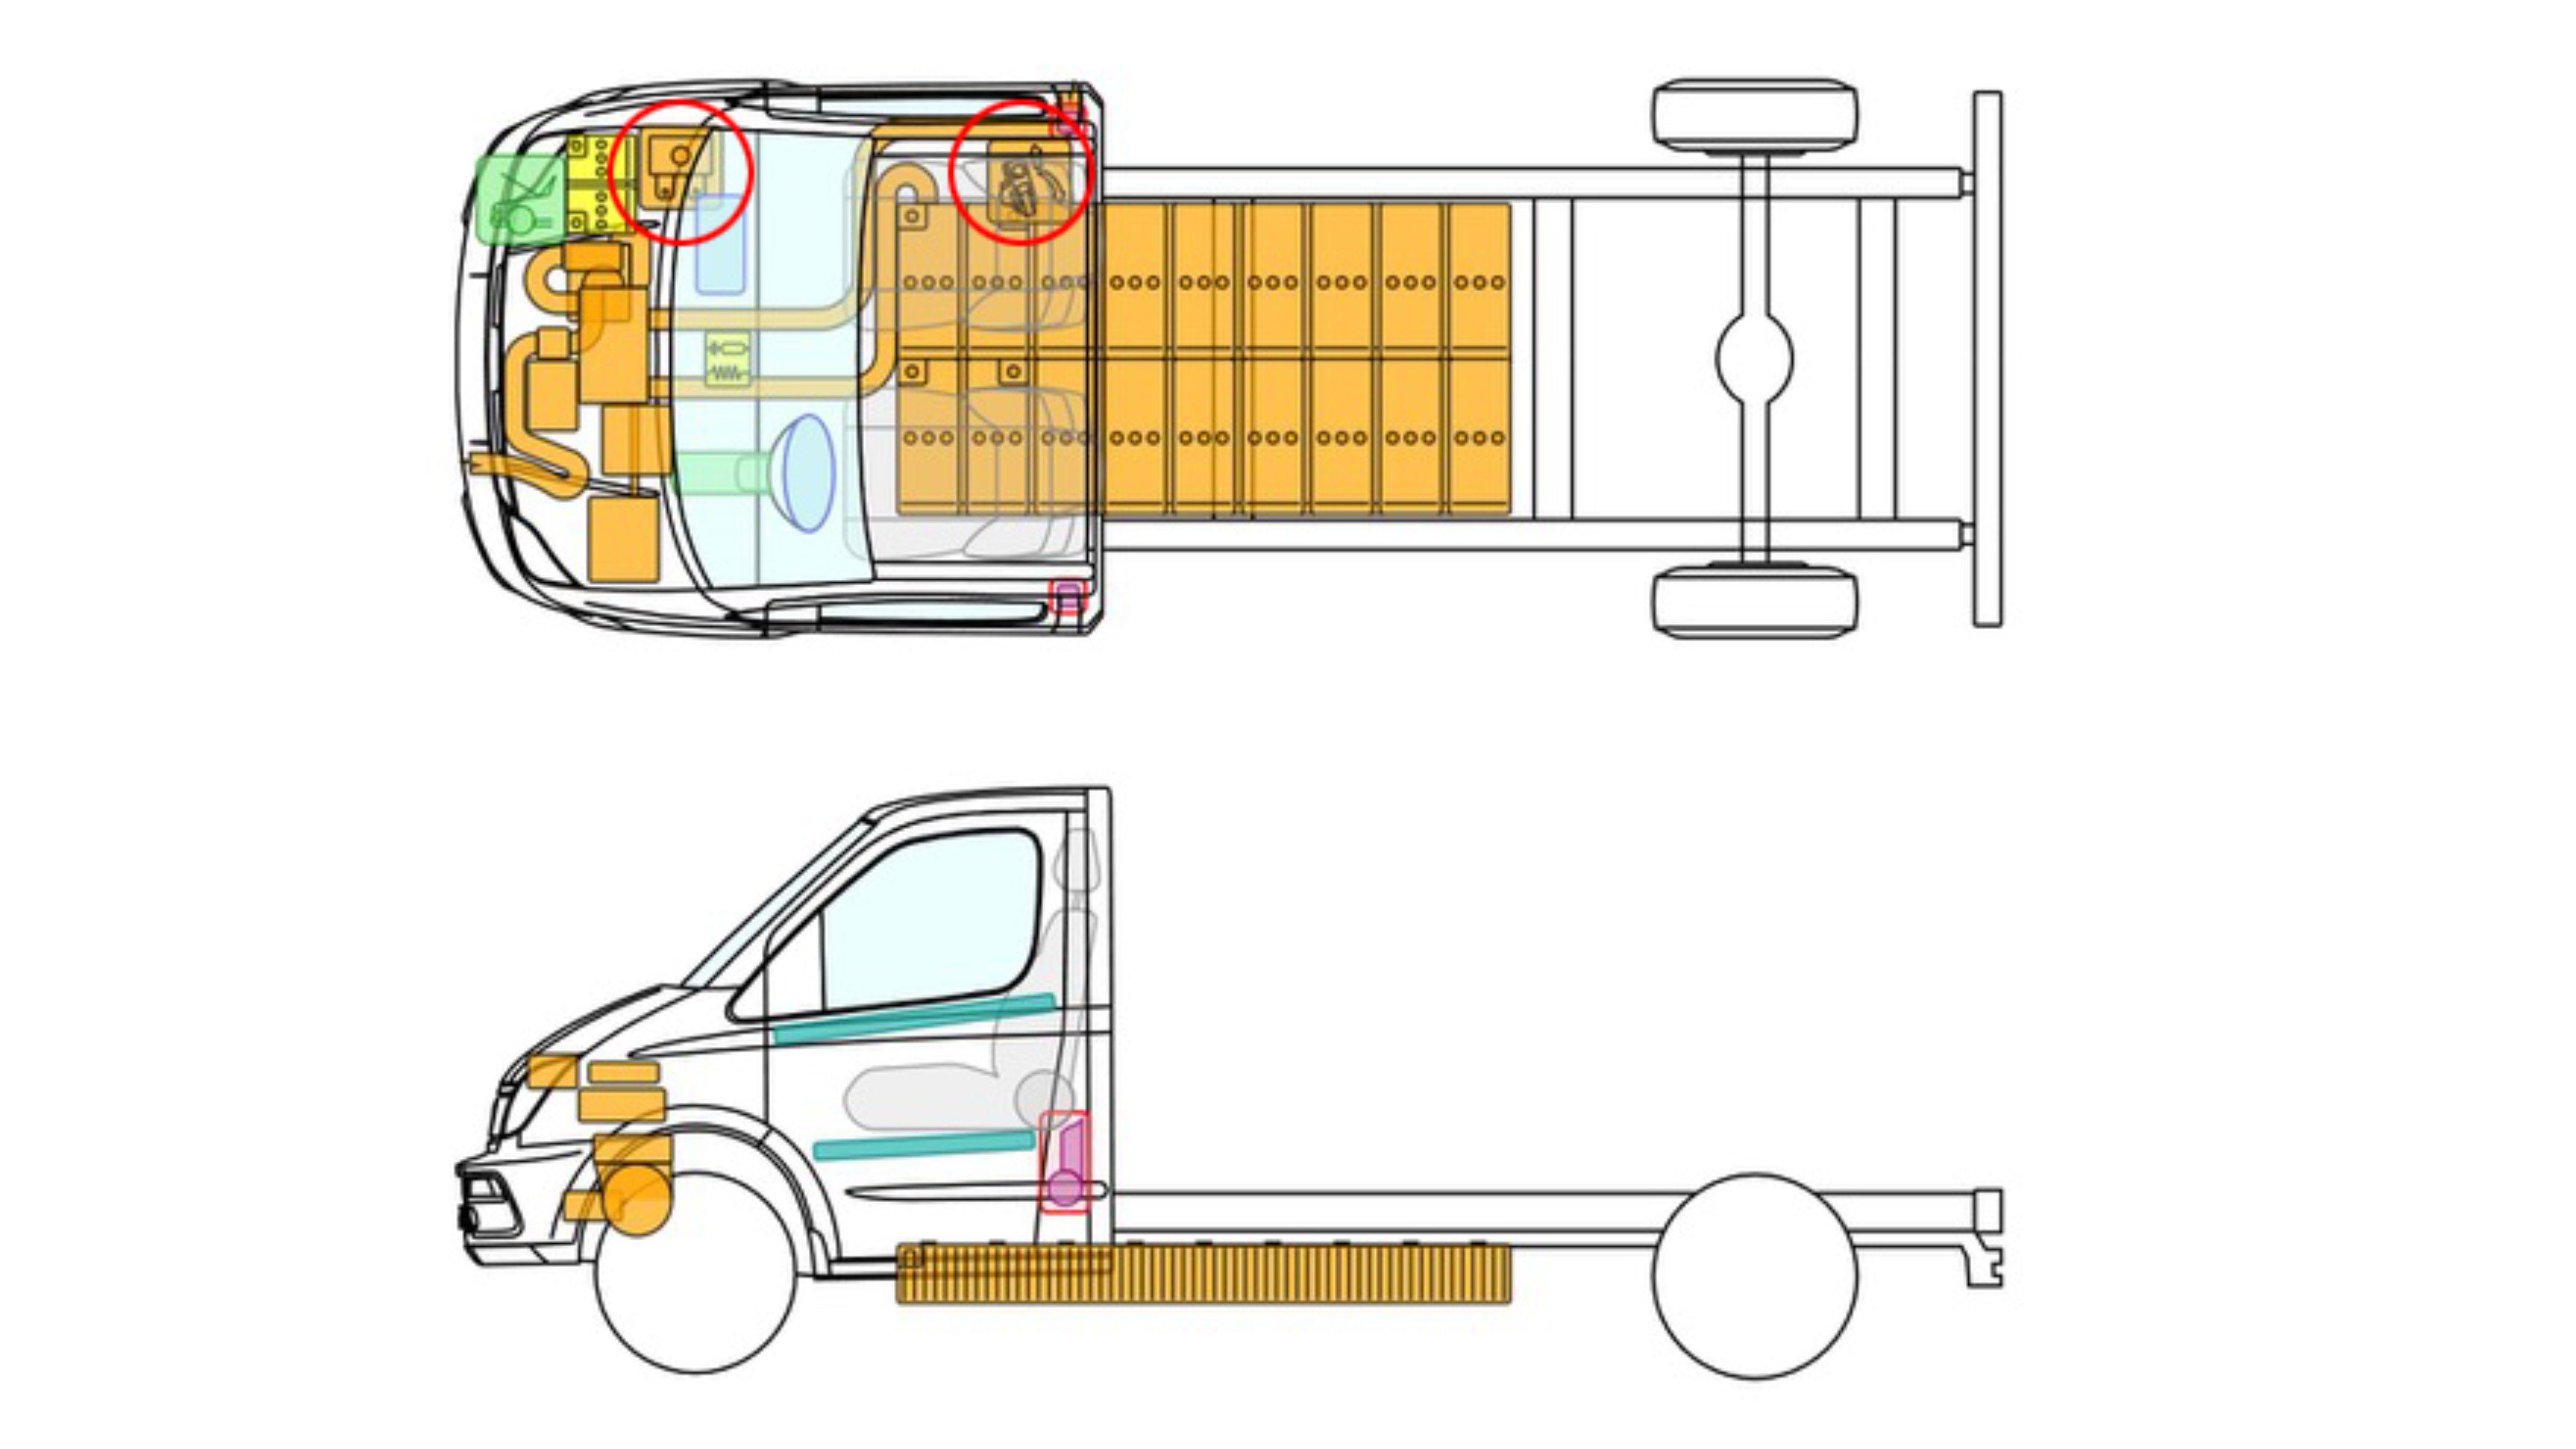 batería ion litio en un camion